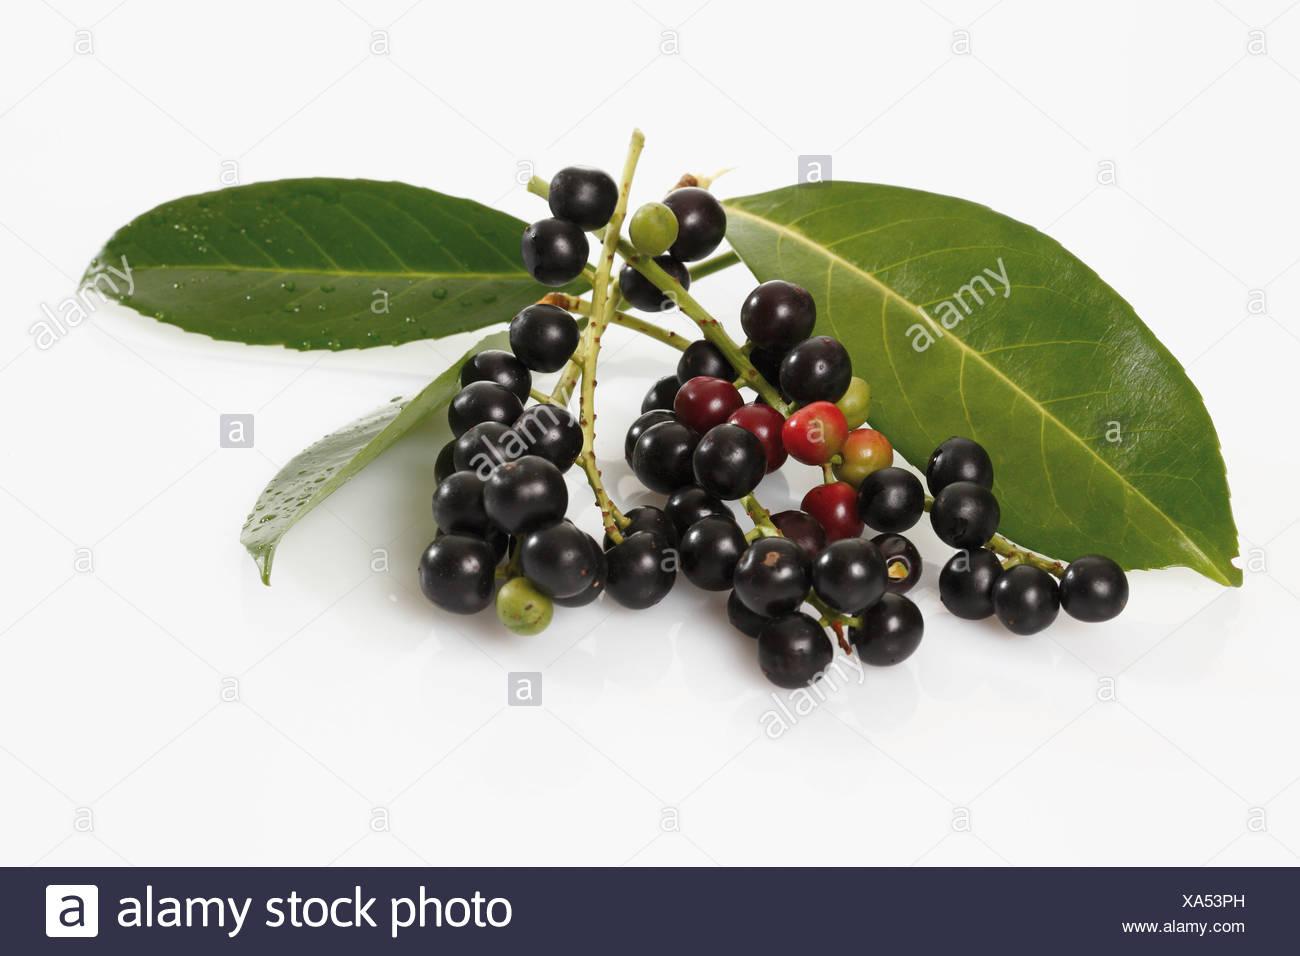 Cherry laurel (Prunus laurocerasus), fruits - Stock Image